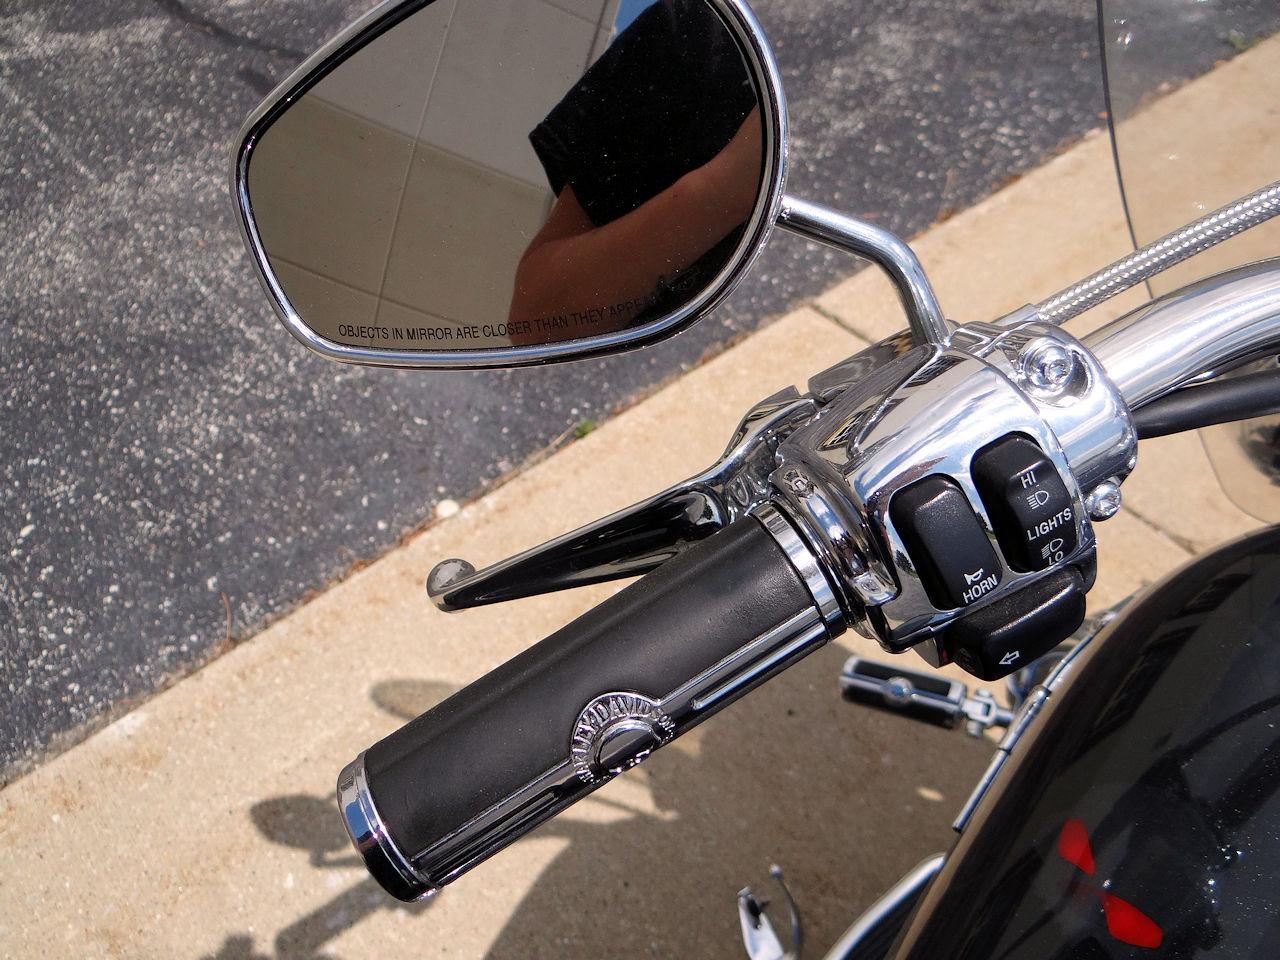 2006 Harley Davidson FLSTNI 71